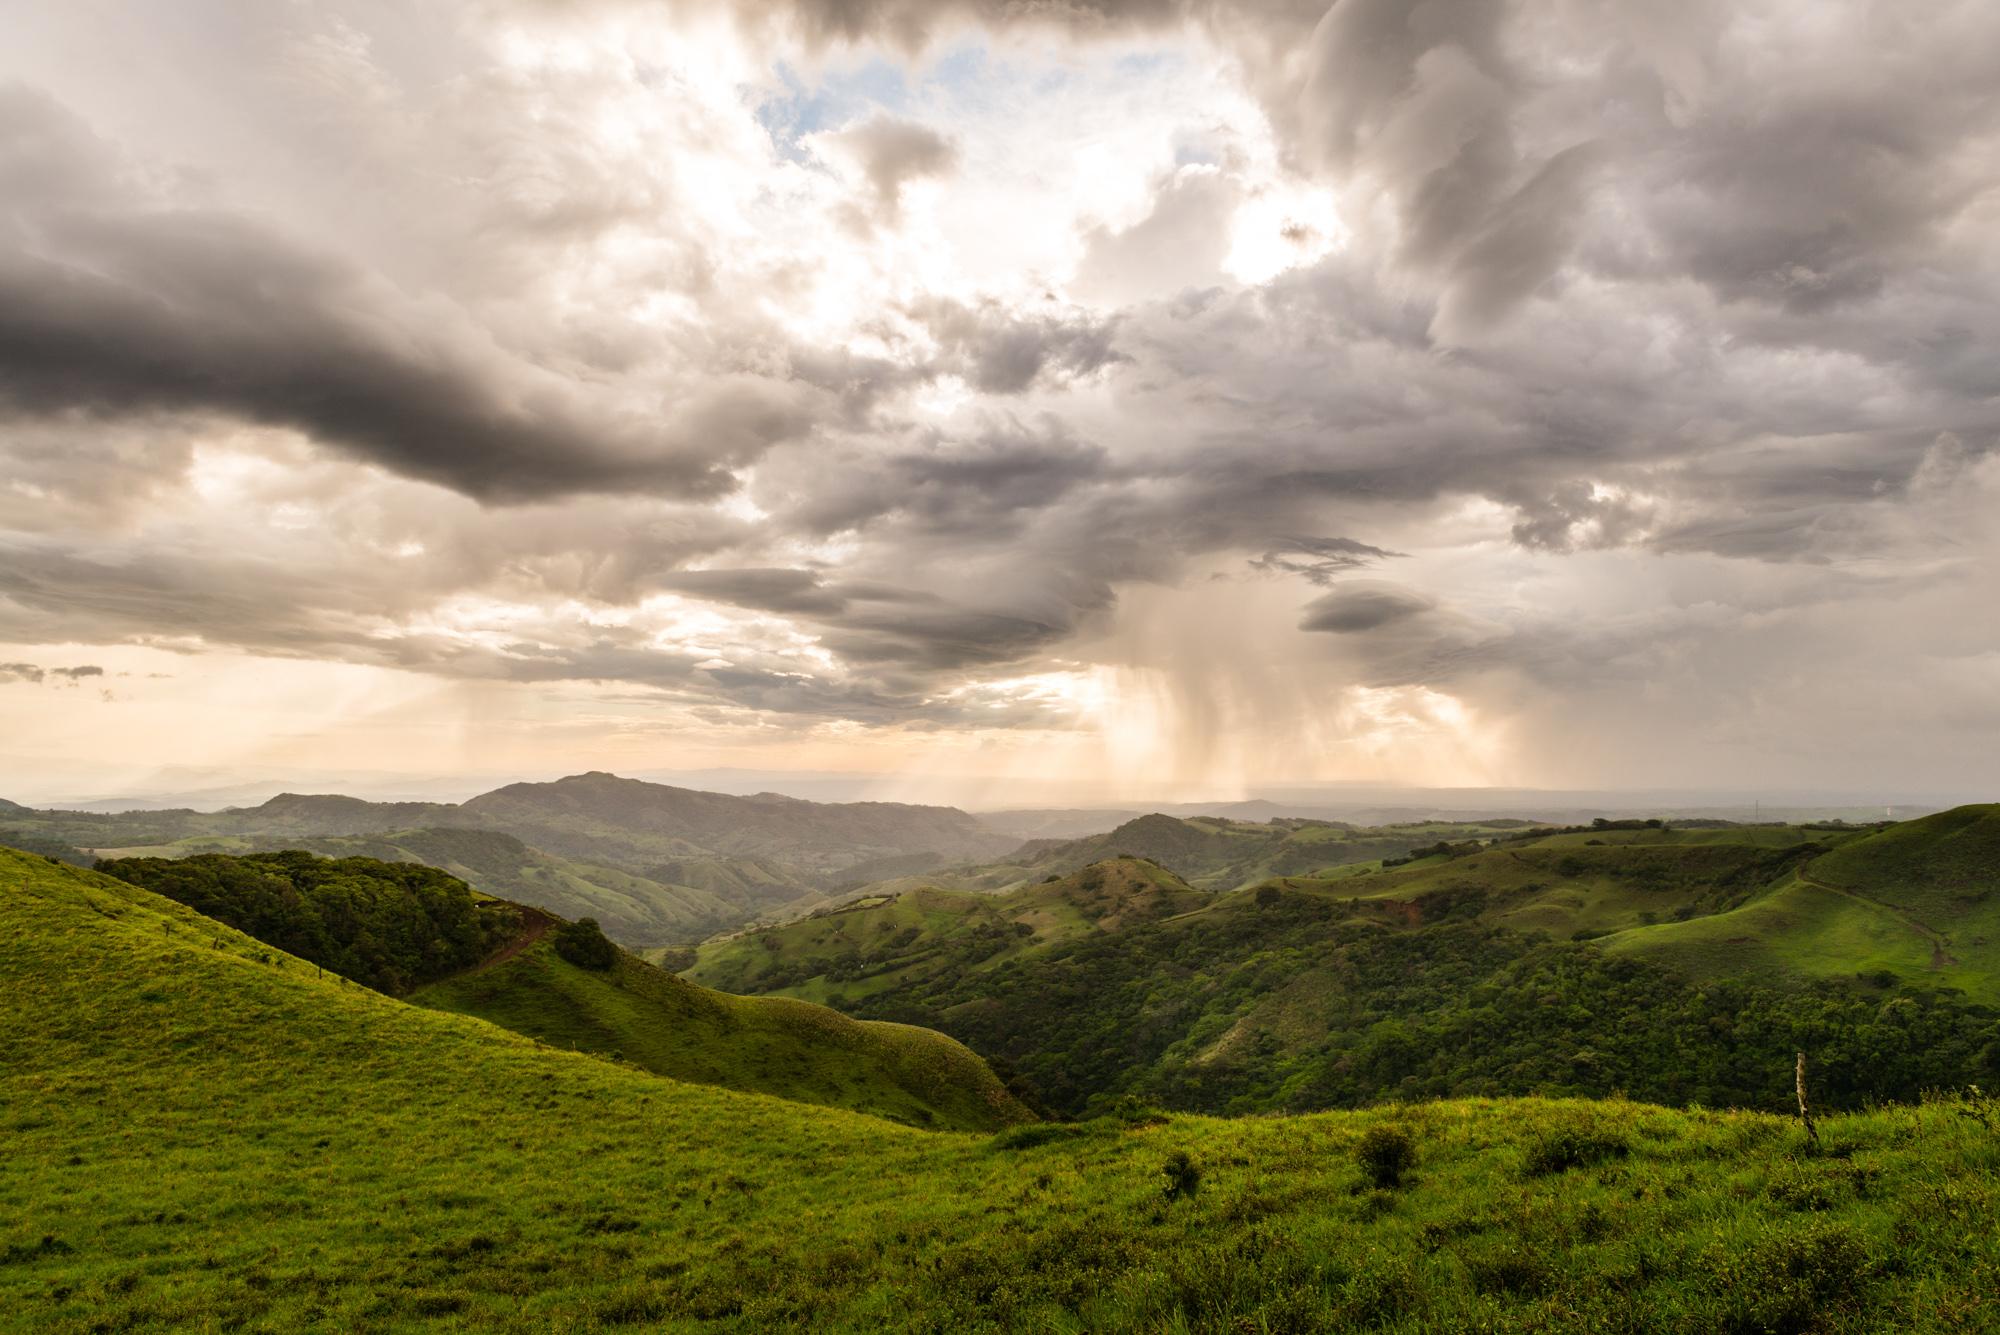 Costa_Rica_Scott_Myers_DSC6860.jpg